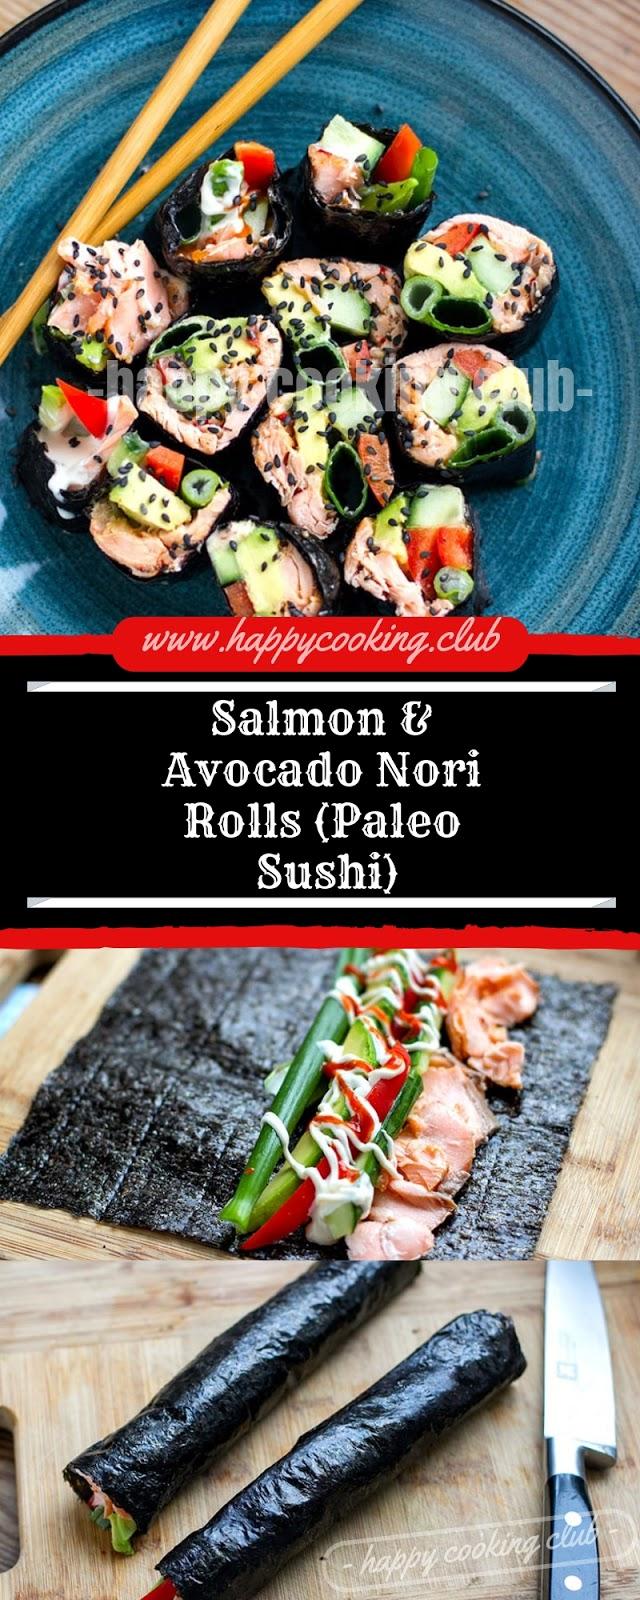 Salmon & Avocado Nori Rolls (Paleo Sushi)